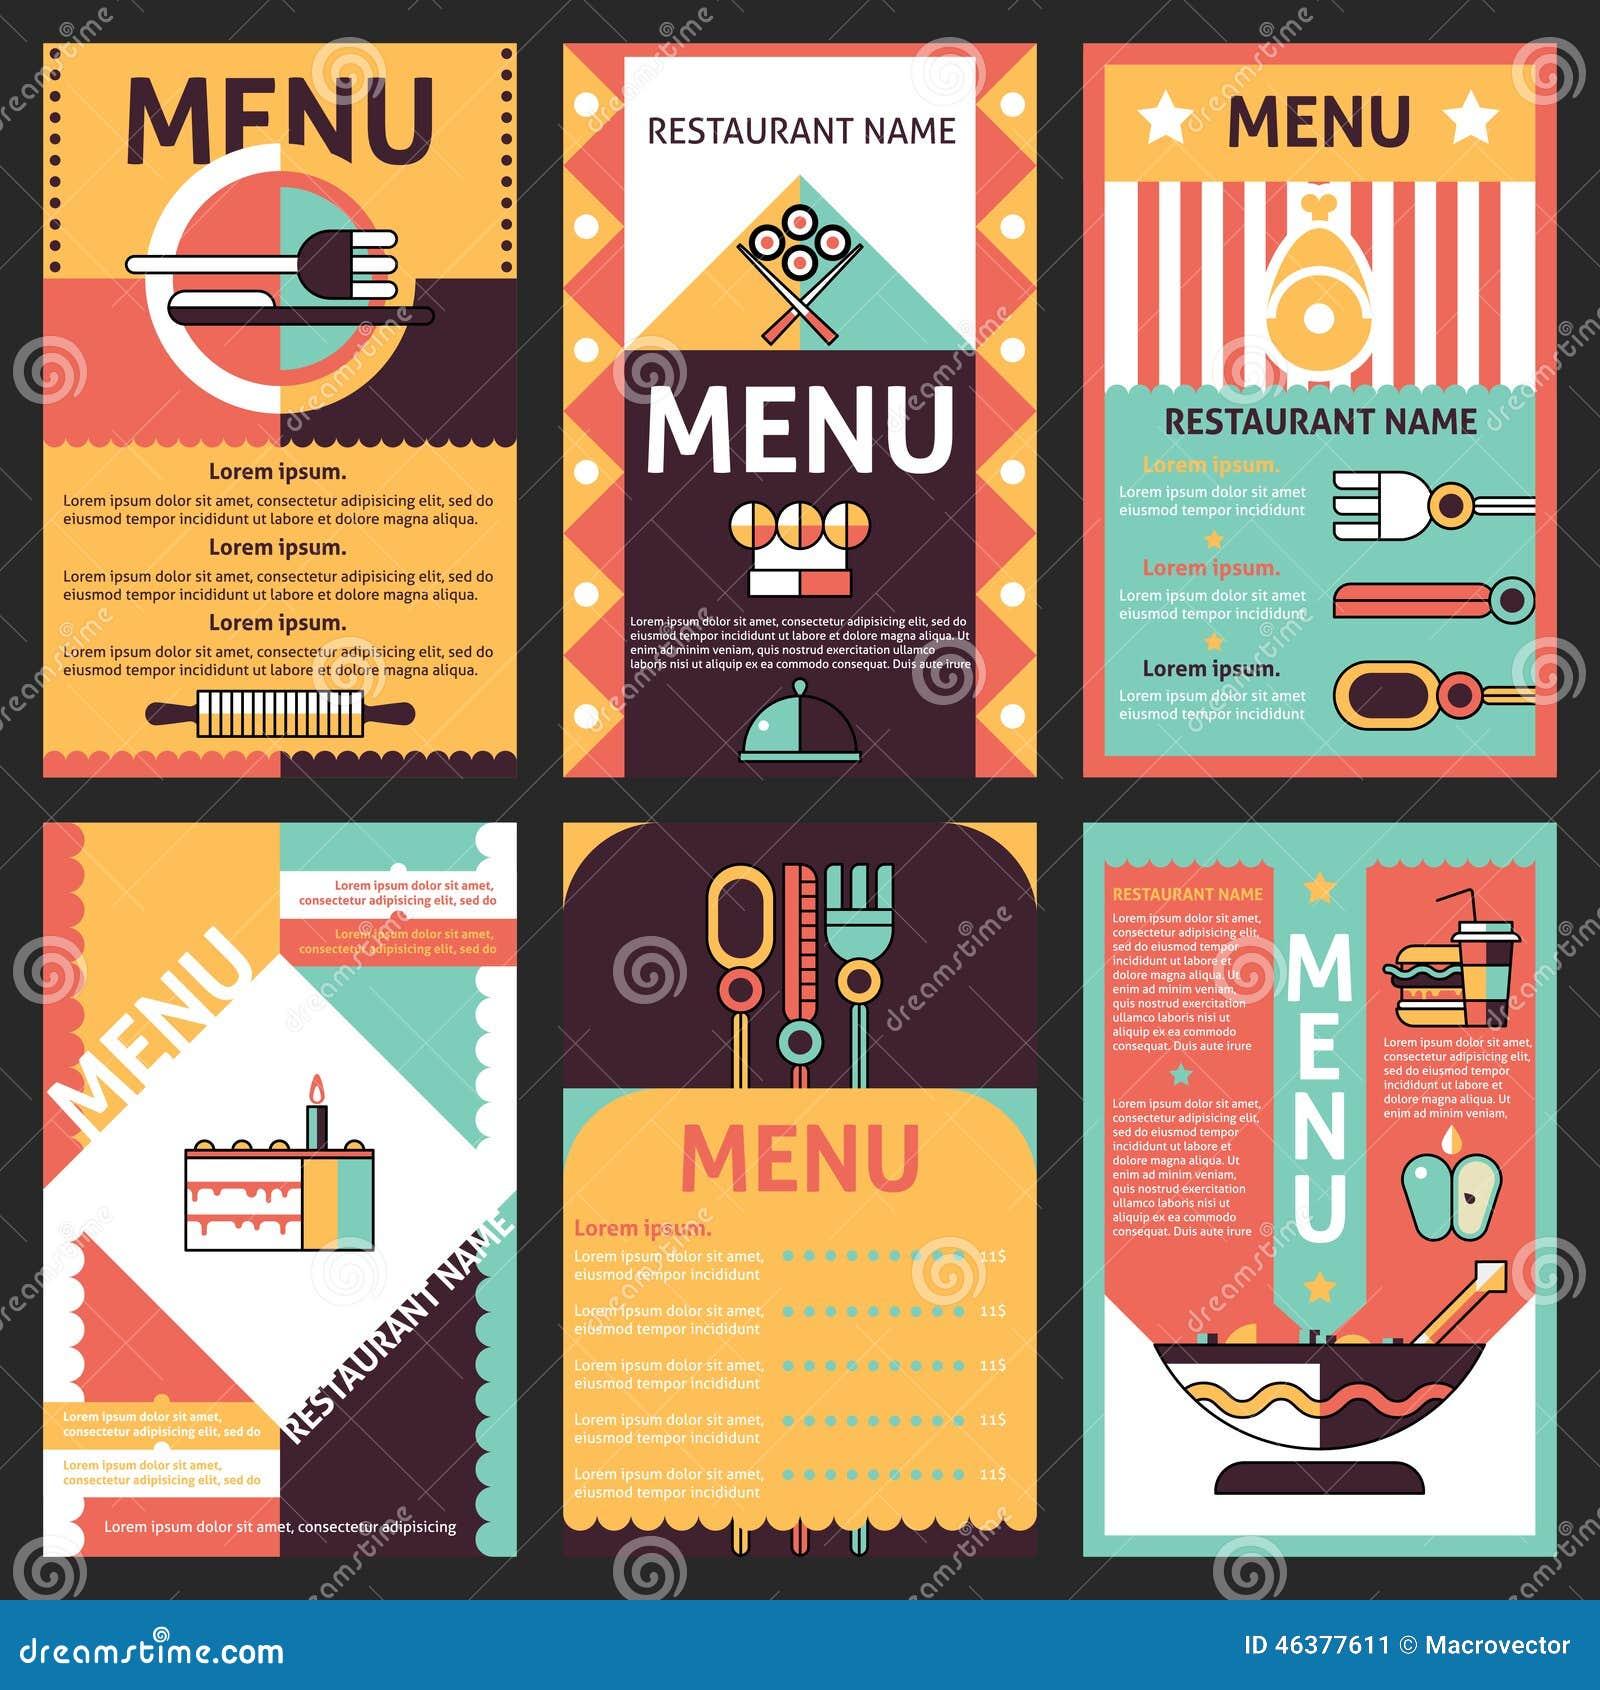 abstract modern restaurant menu list designs set with decorative